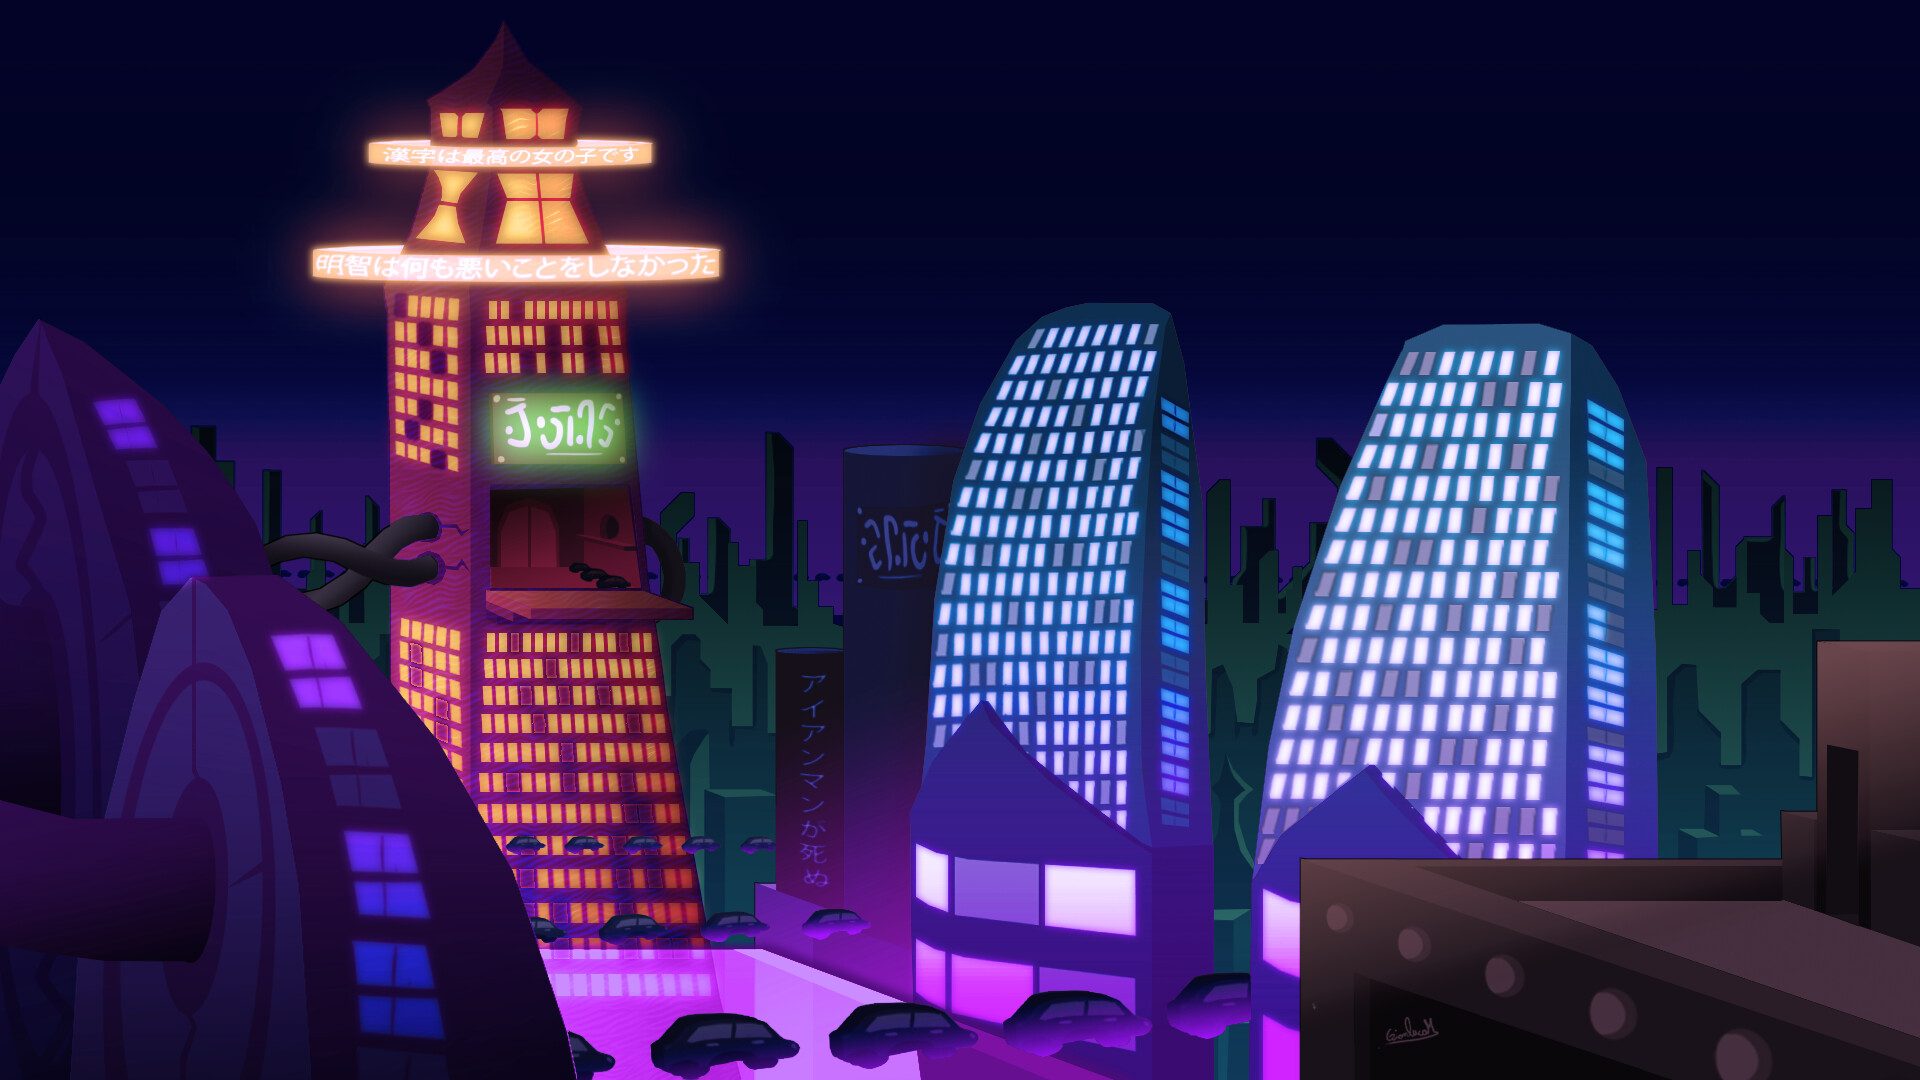 Gianluca Mascaro Futuristic City Background